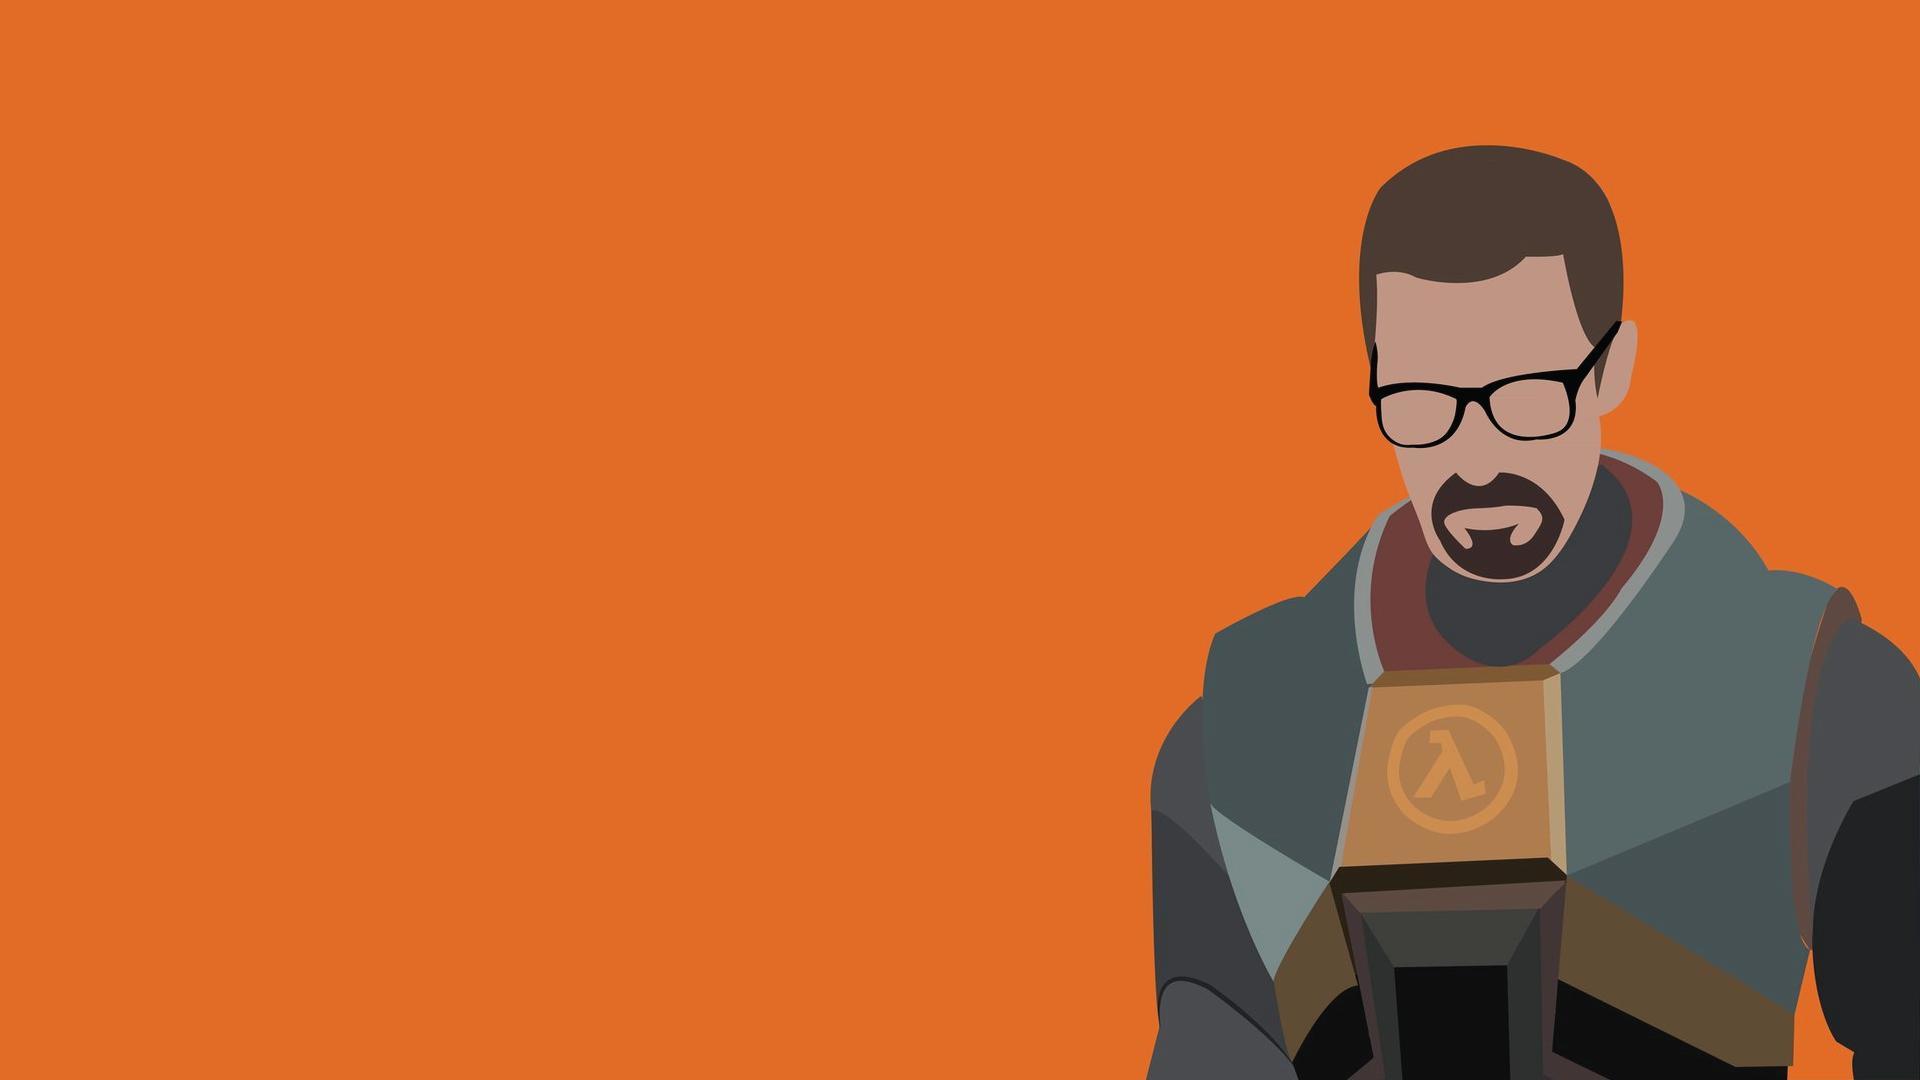 Wallpaper Gordon Freeman Half Life Ph D Hd Widescreen